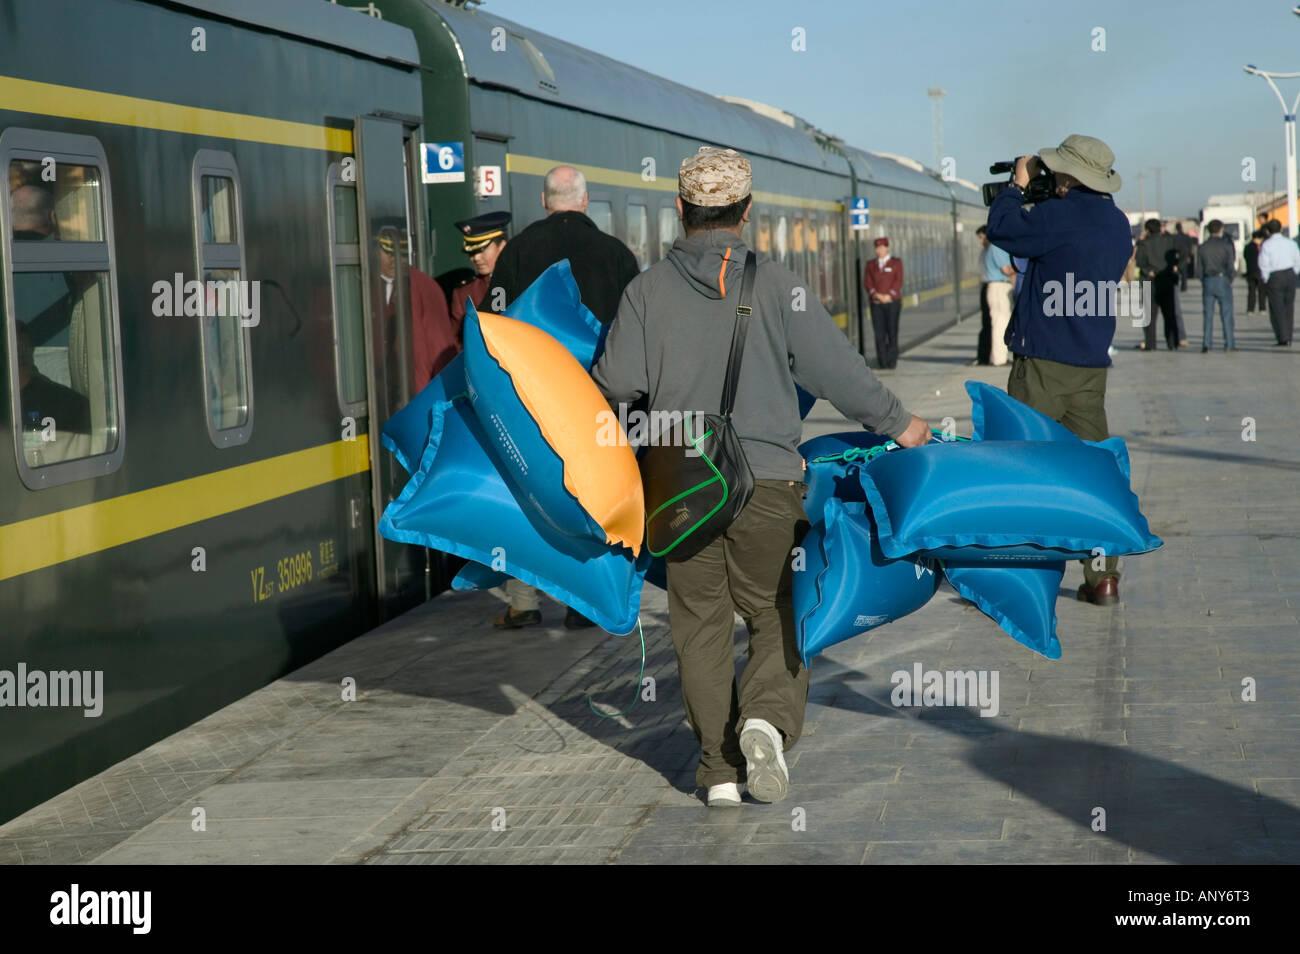 Oxygen pillows, Qingzang/Qinghai-Xizang train, the world's highest railway, Tibet - Stock Image